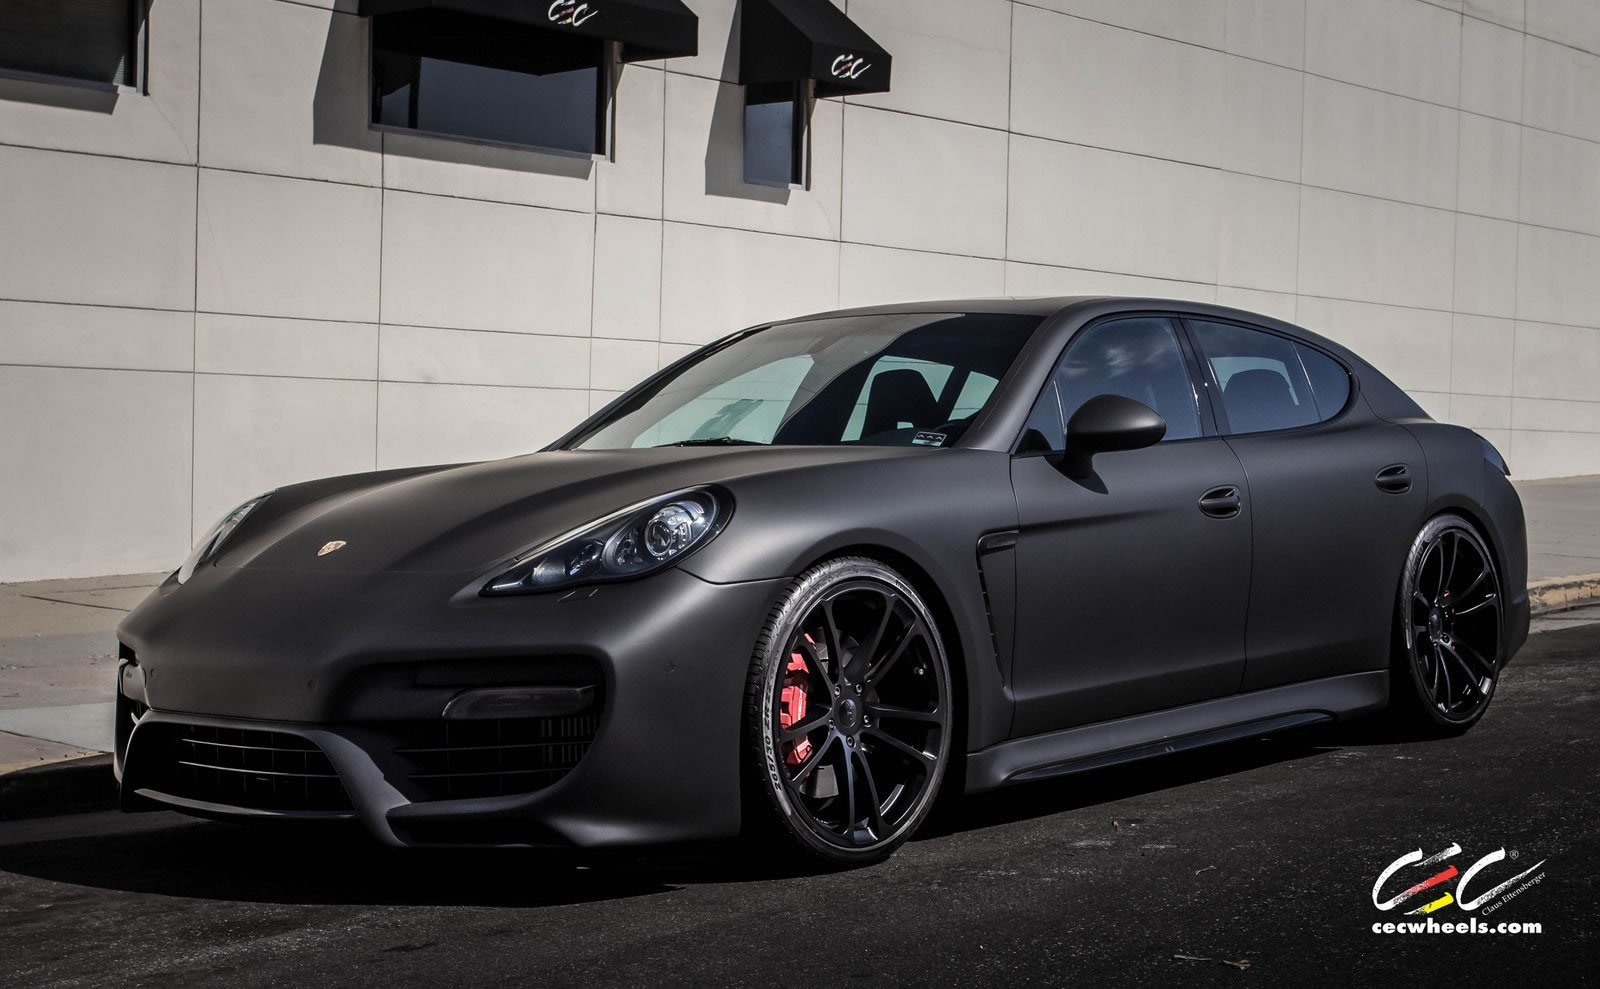 2015 cars cec tuning wheels porsche panamera turbo wallpaper 1600x989 620110 wallpaperup - 2015 Porsche Panamera Black